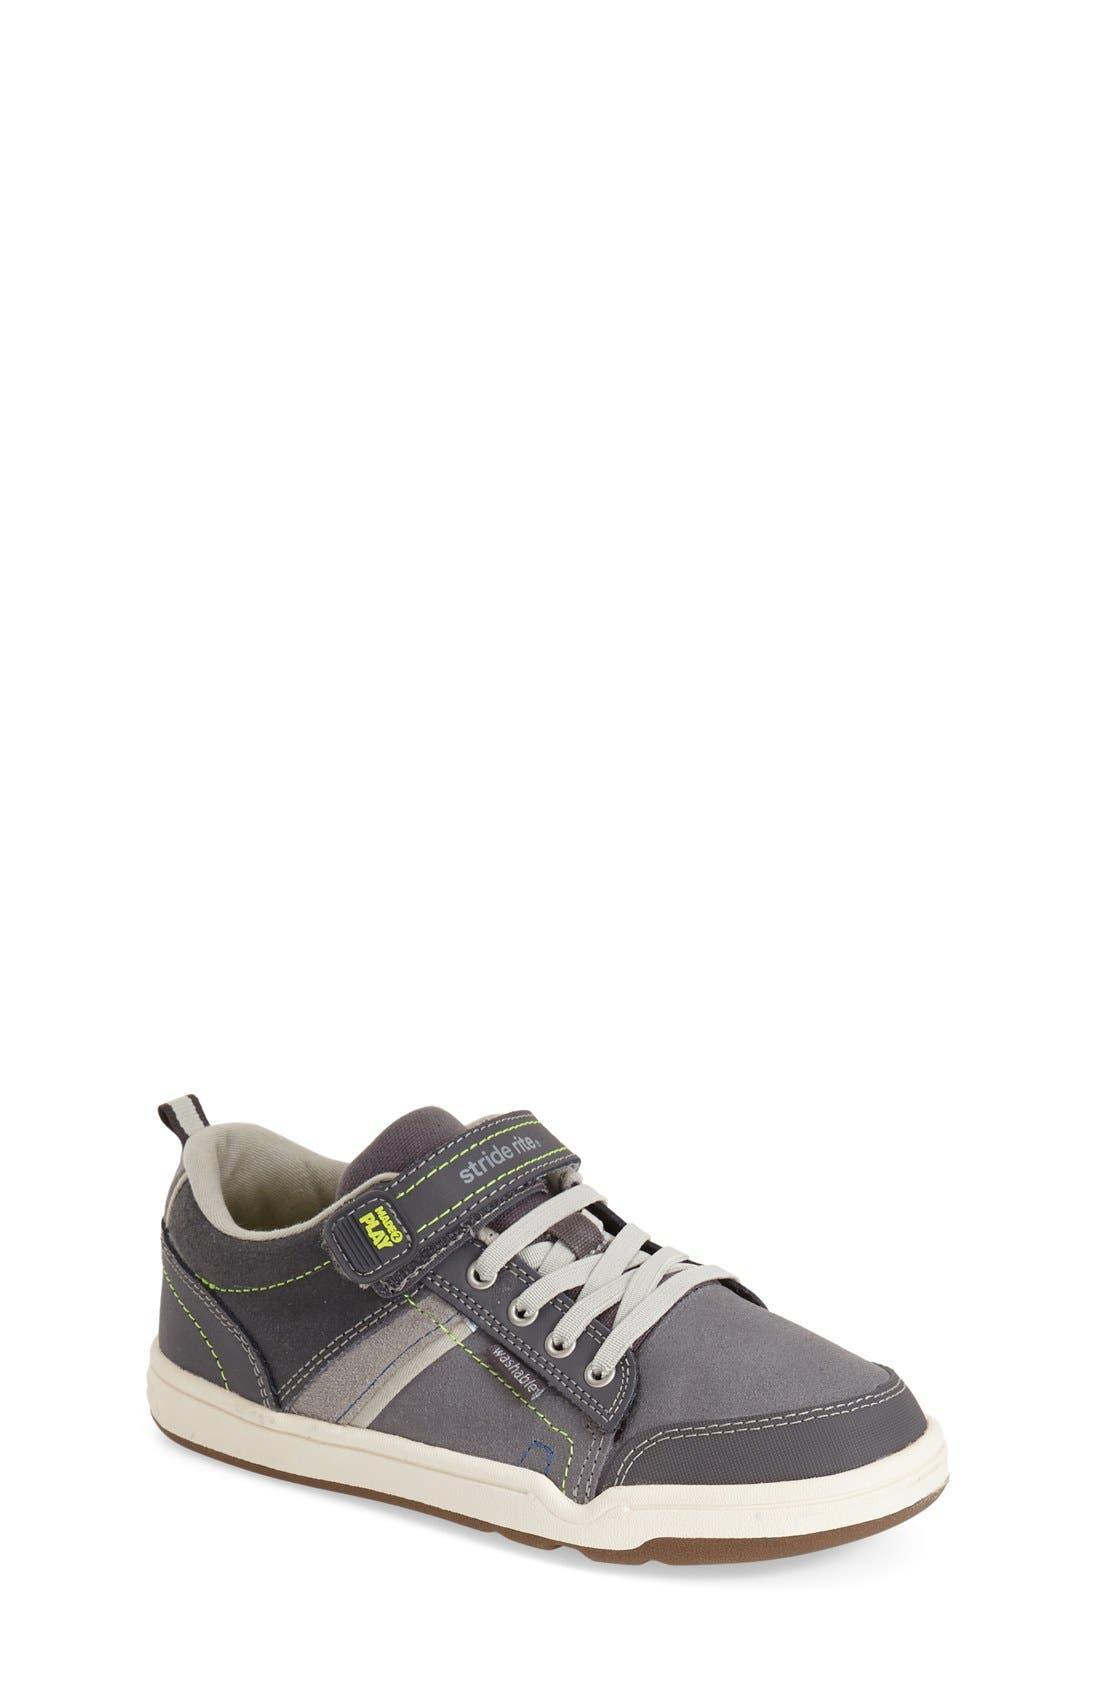 'Made 2 Play<sup>®</sup> Caleb' Sneaker,                         Main,                         color,